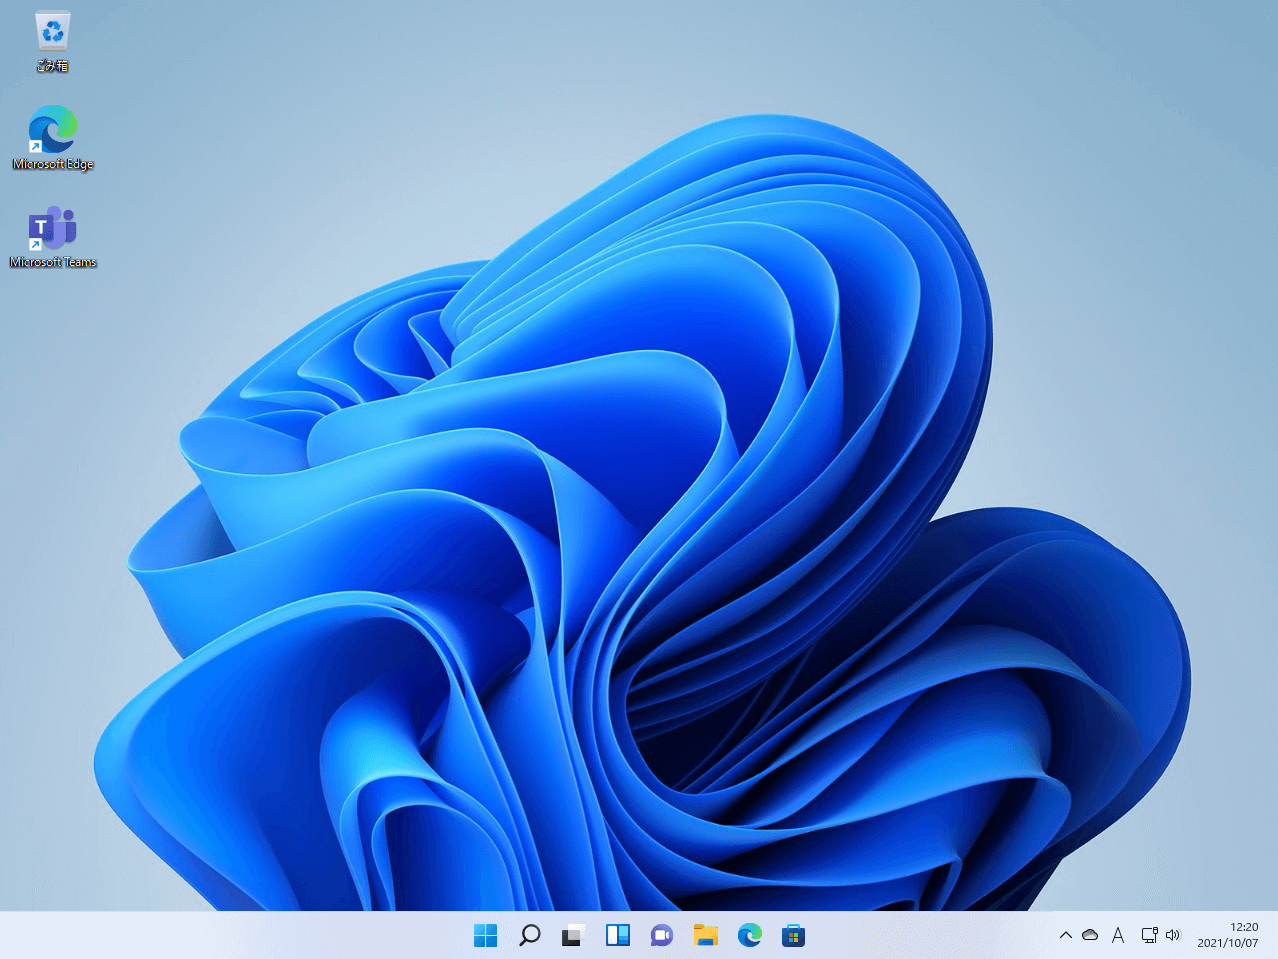 Windows 11の仮想デスクトップを利用する。壁紙を変えれば迷わない